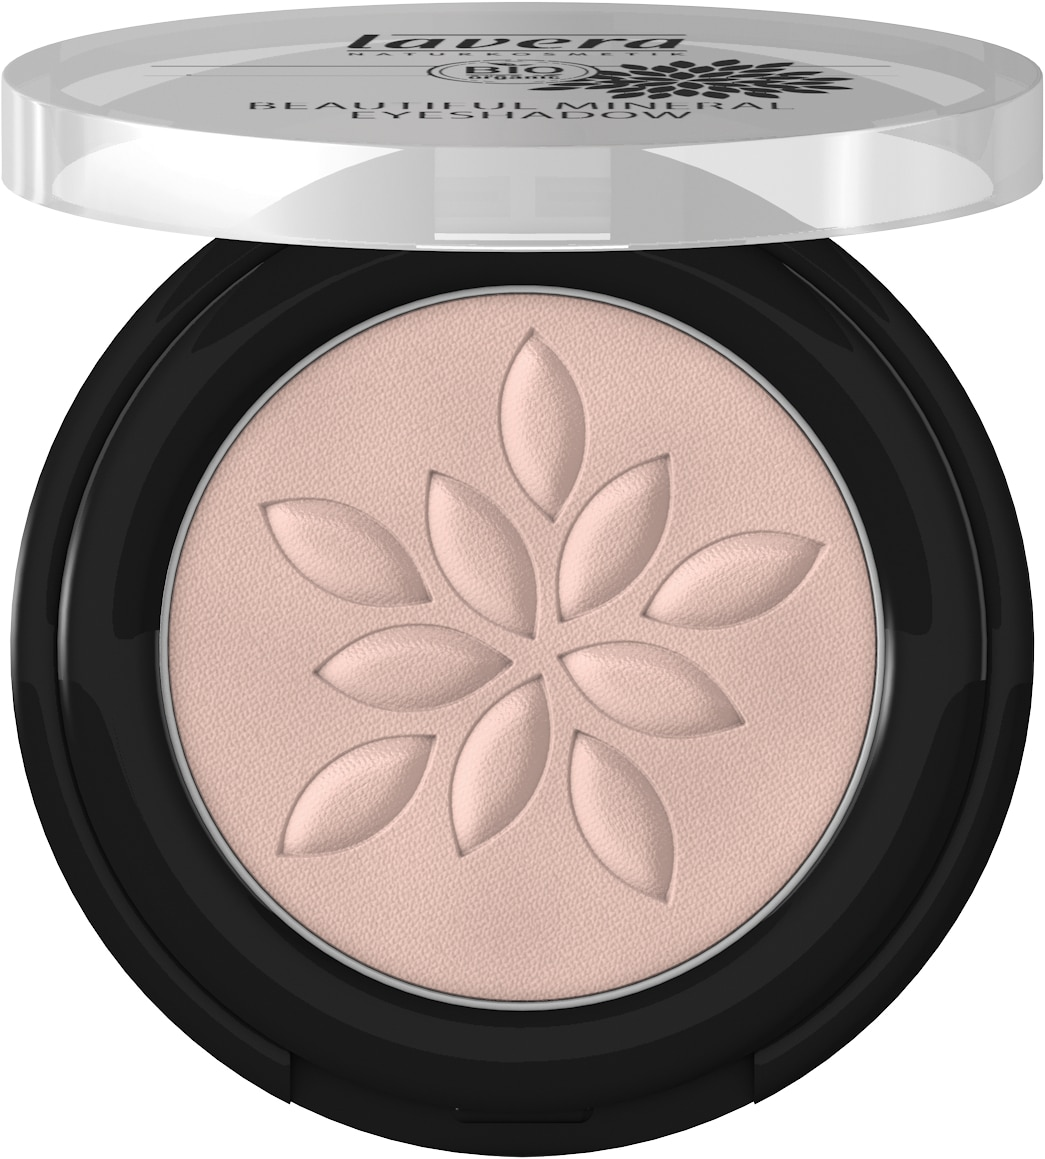 Make-up-Set Everyday Elegance (MHD 01.05.2021)